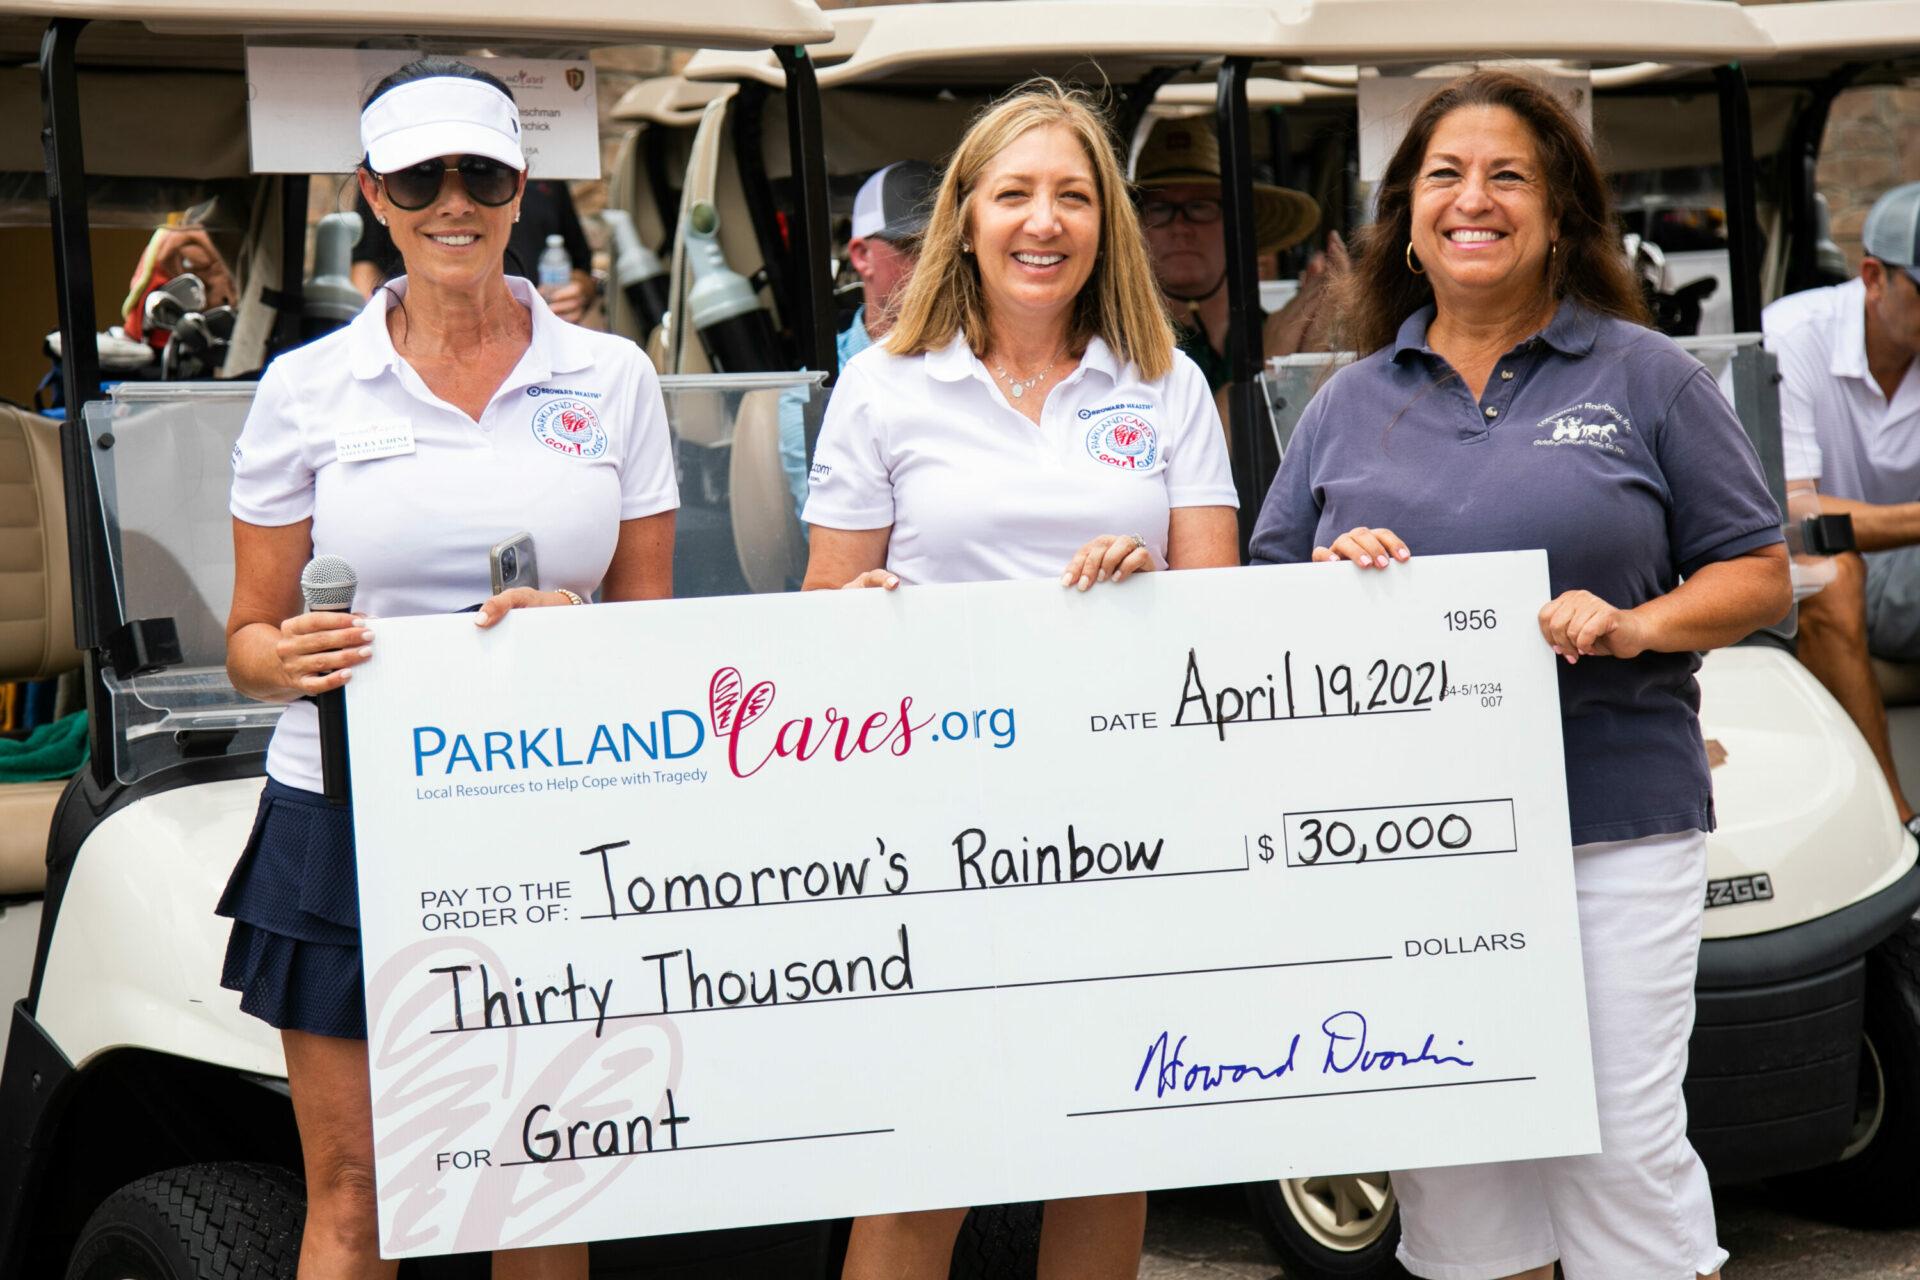 Parkland Cares Golf Tournament grant towards Tomorrow's Rainbow